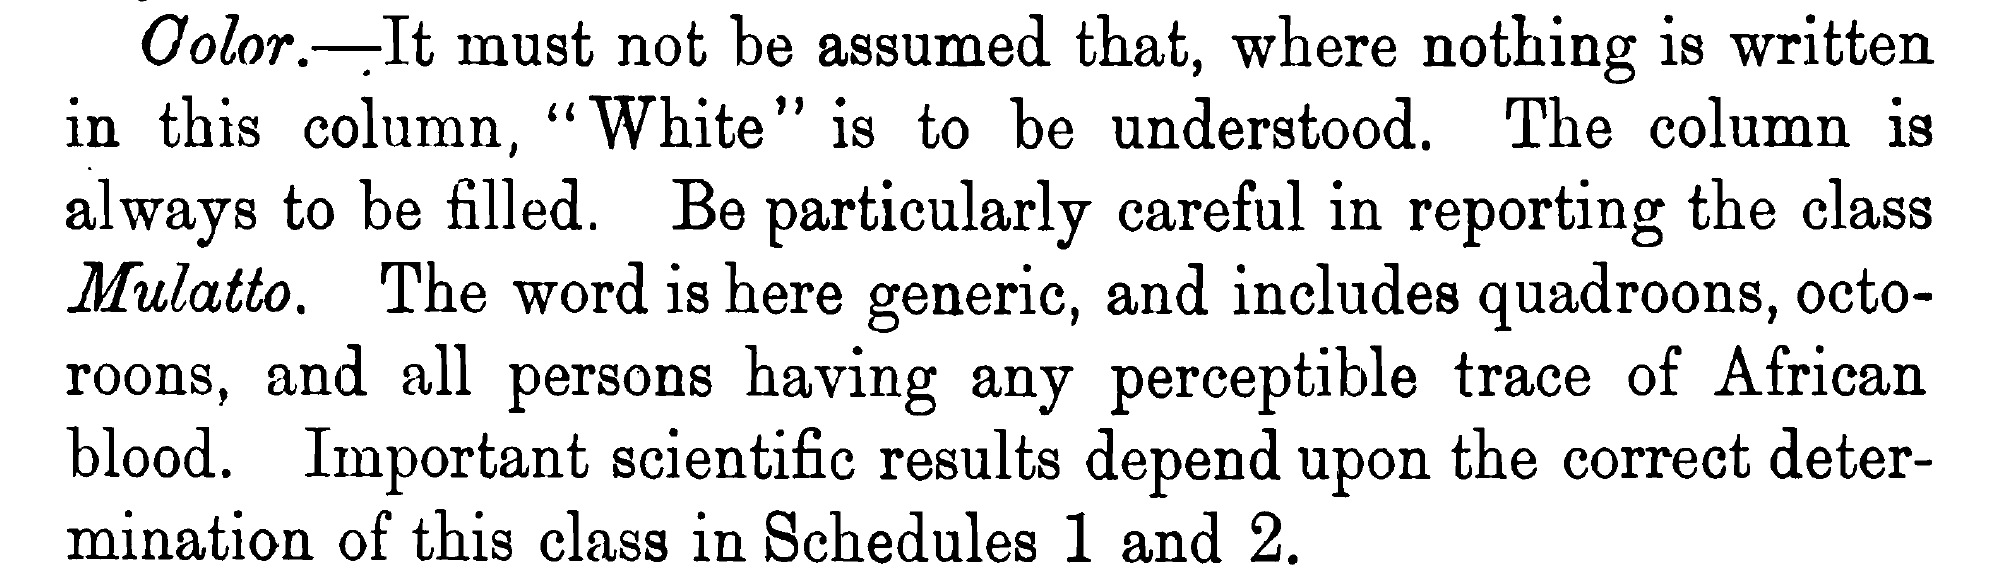 Color 1870 census